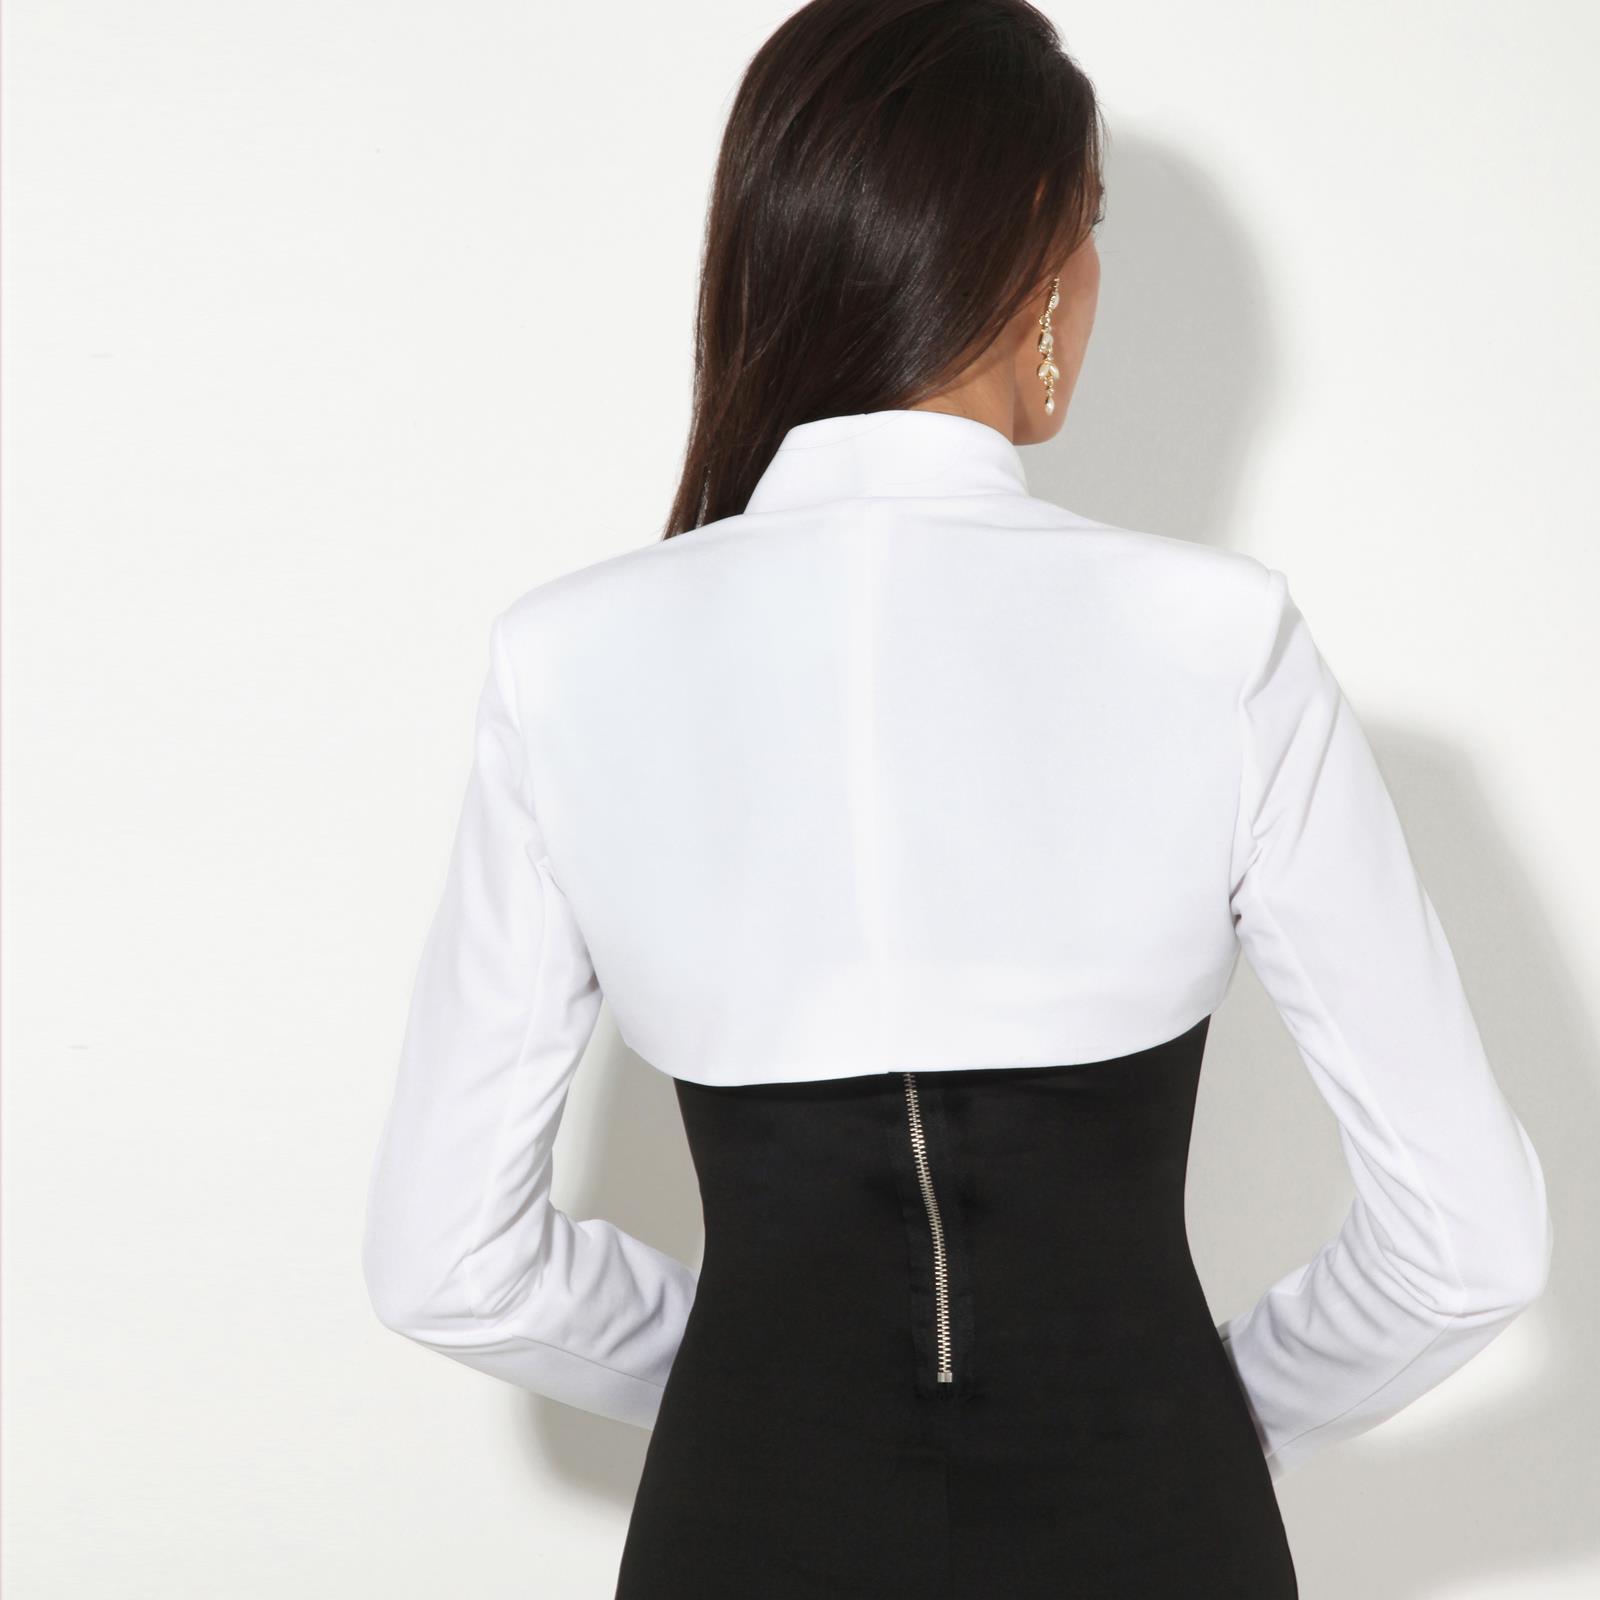 Femmes-Veste-Courte-Bolero-Blazer-Jacket-Manche-3-4-Gilet-Cardigan-Cache-Epaule miniature 3